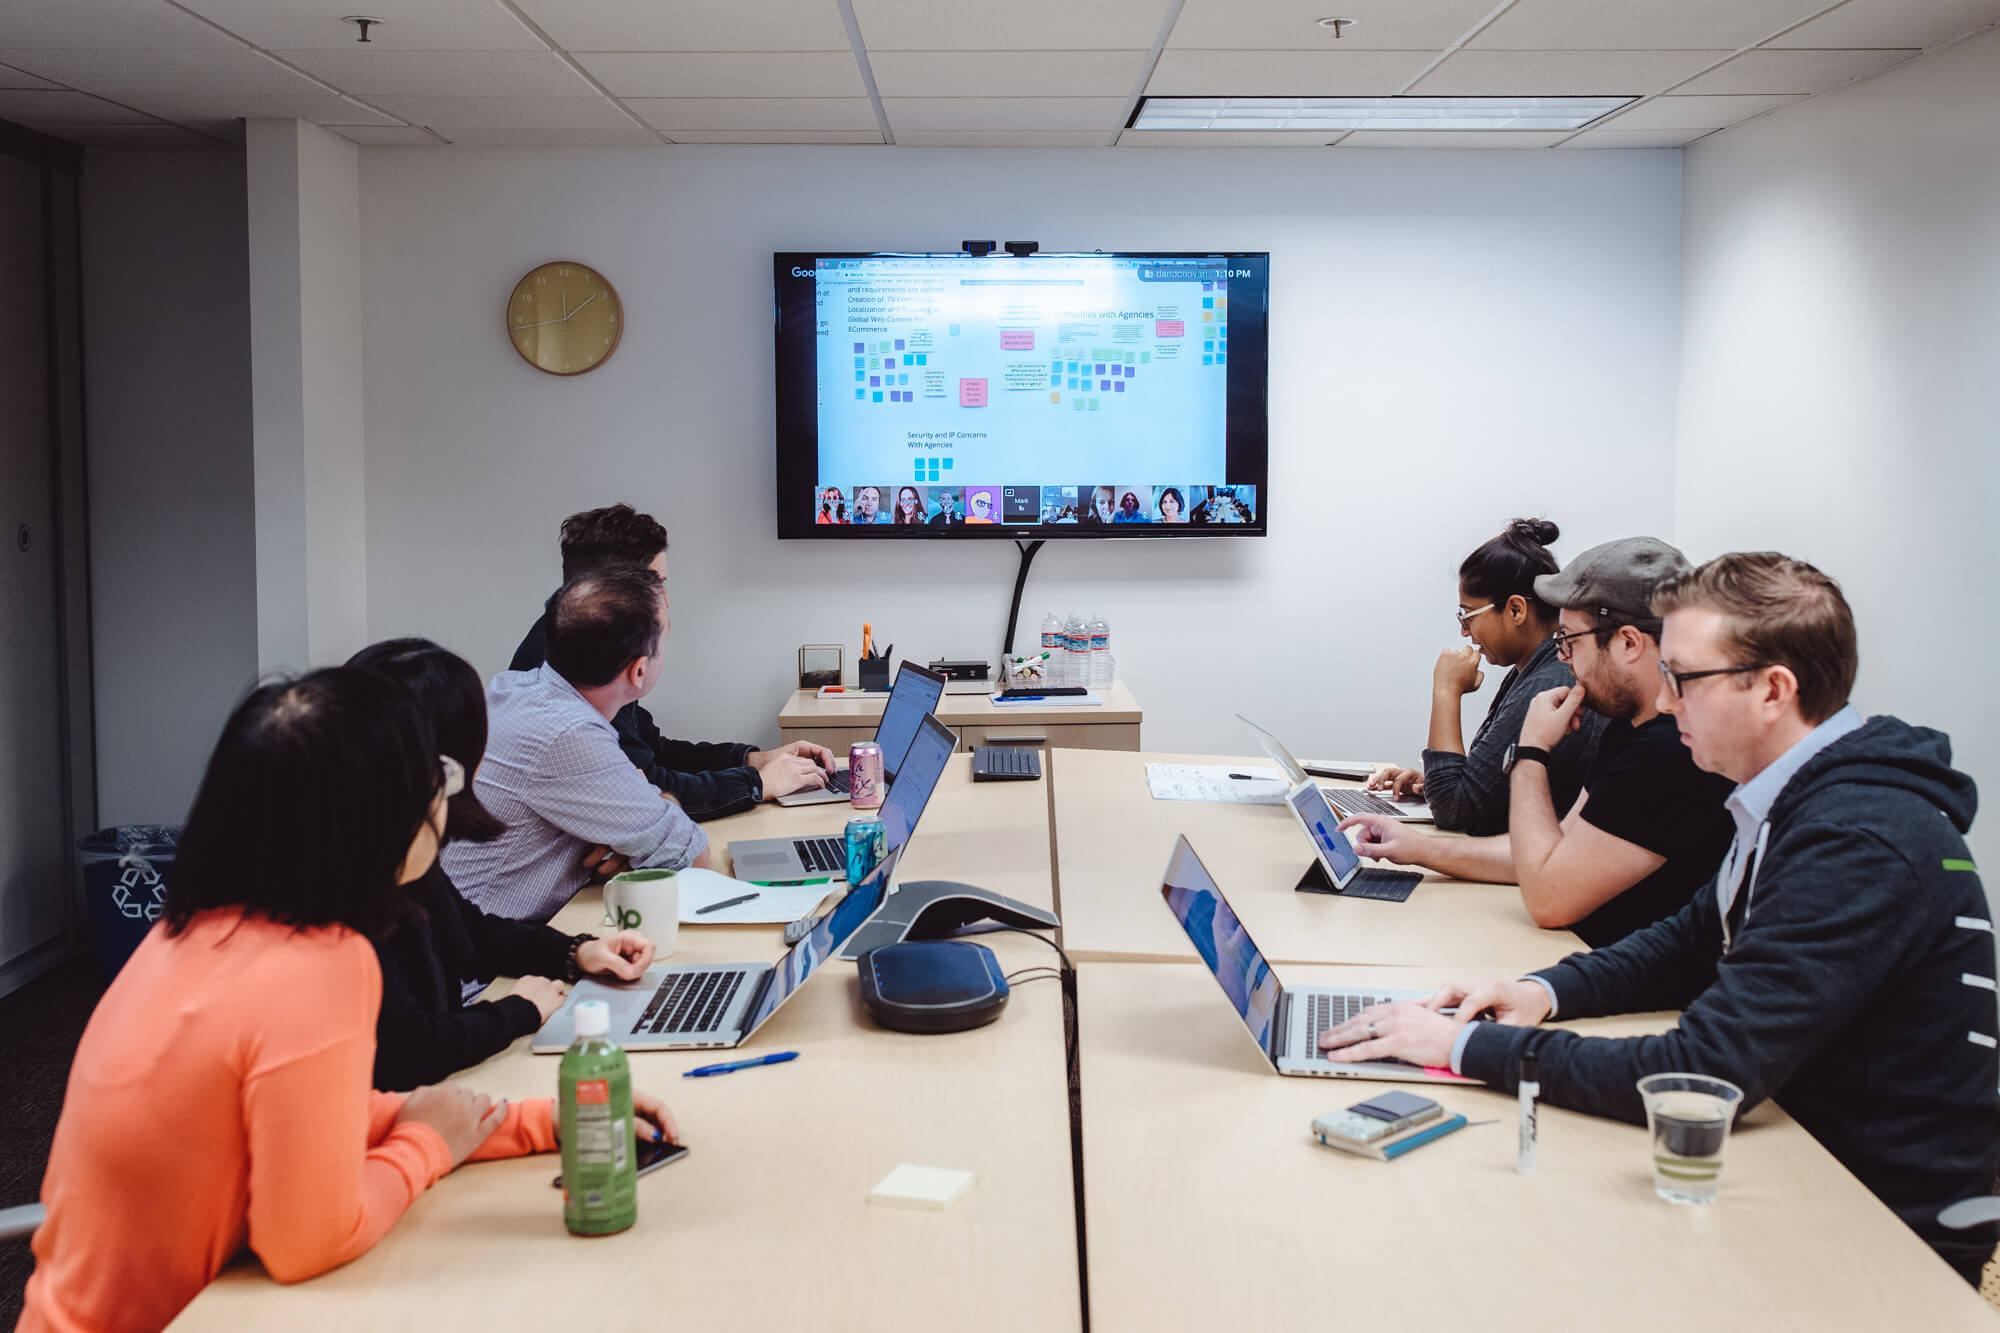 active team collaboration meeting using Miro